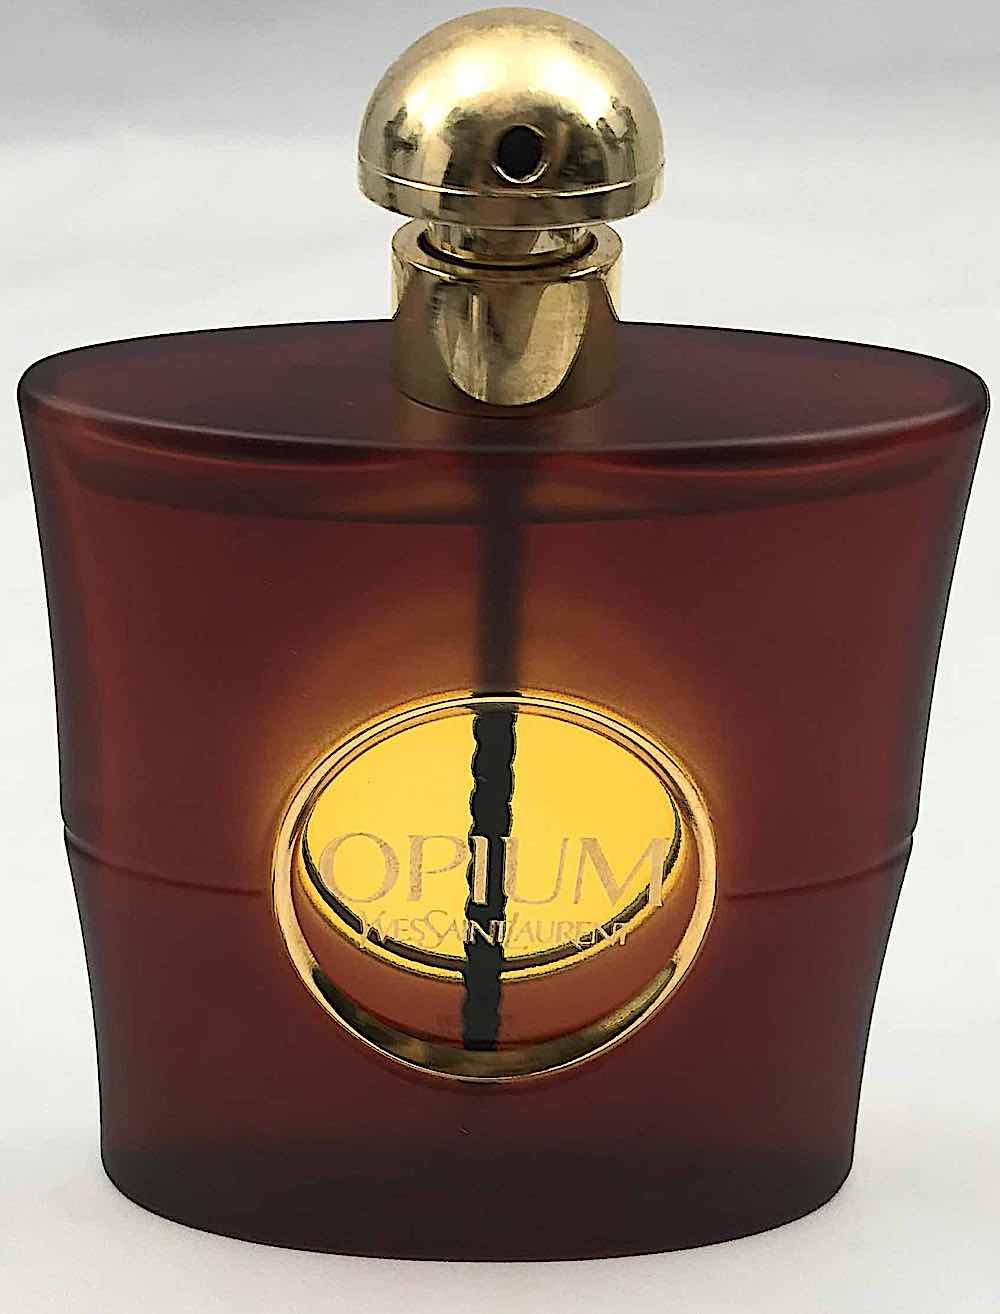 Opium perfume 1967, color bottle, Yves Saint Laurent